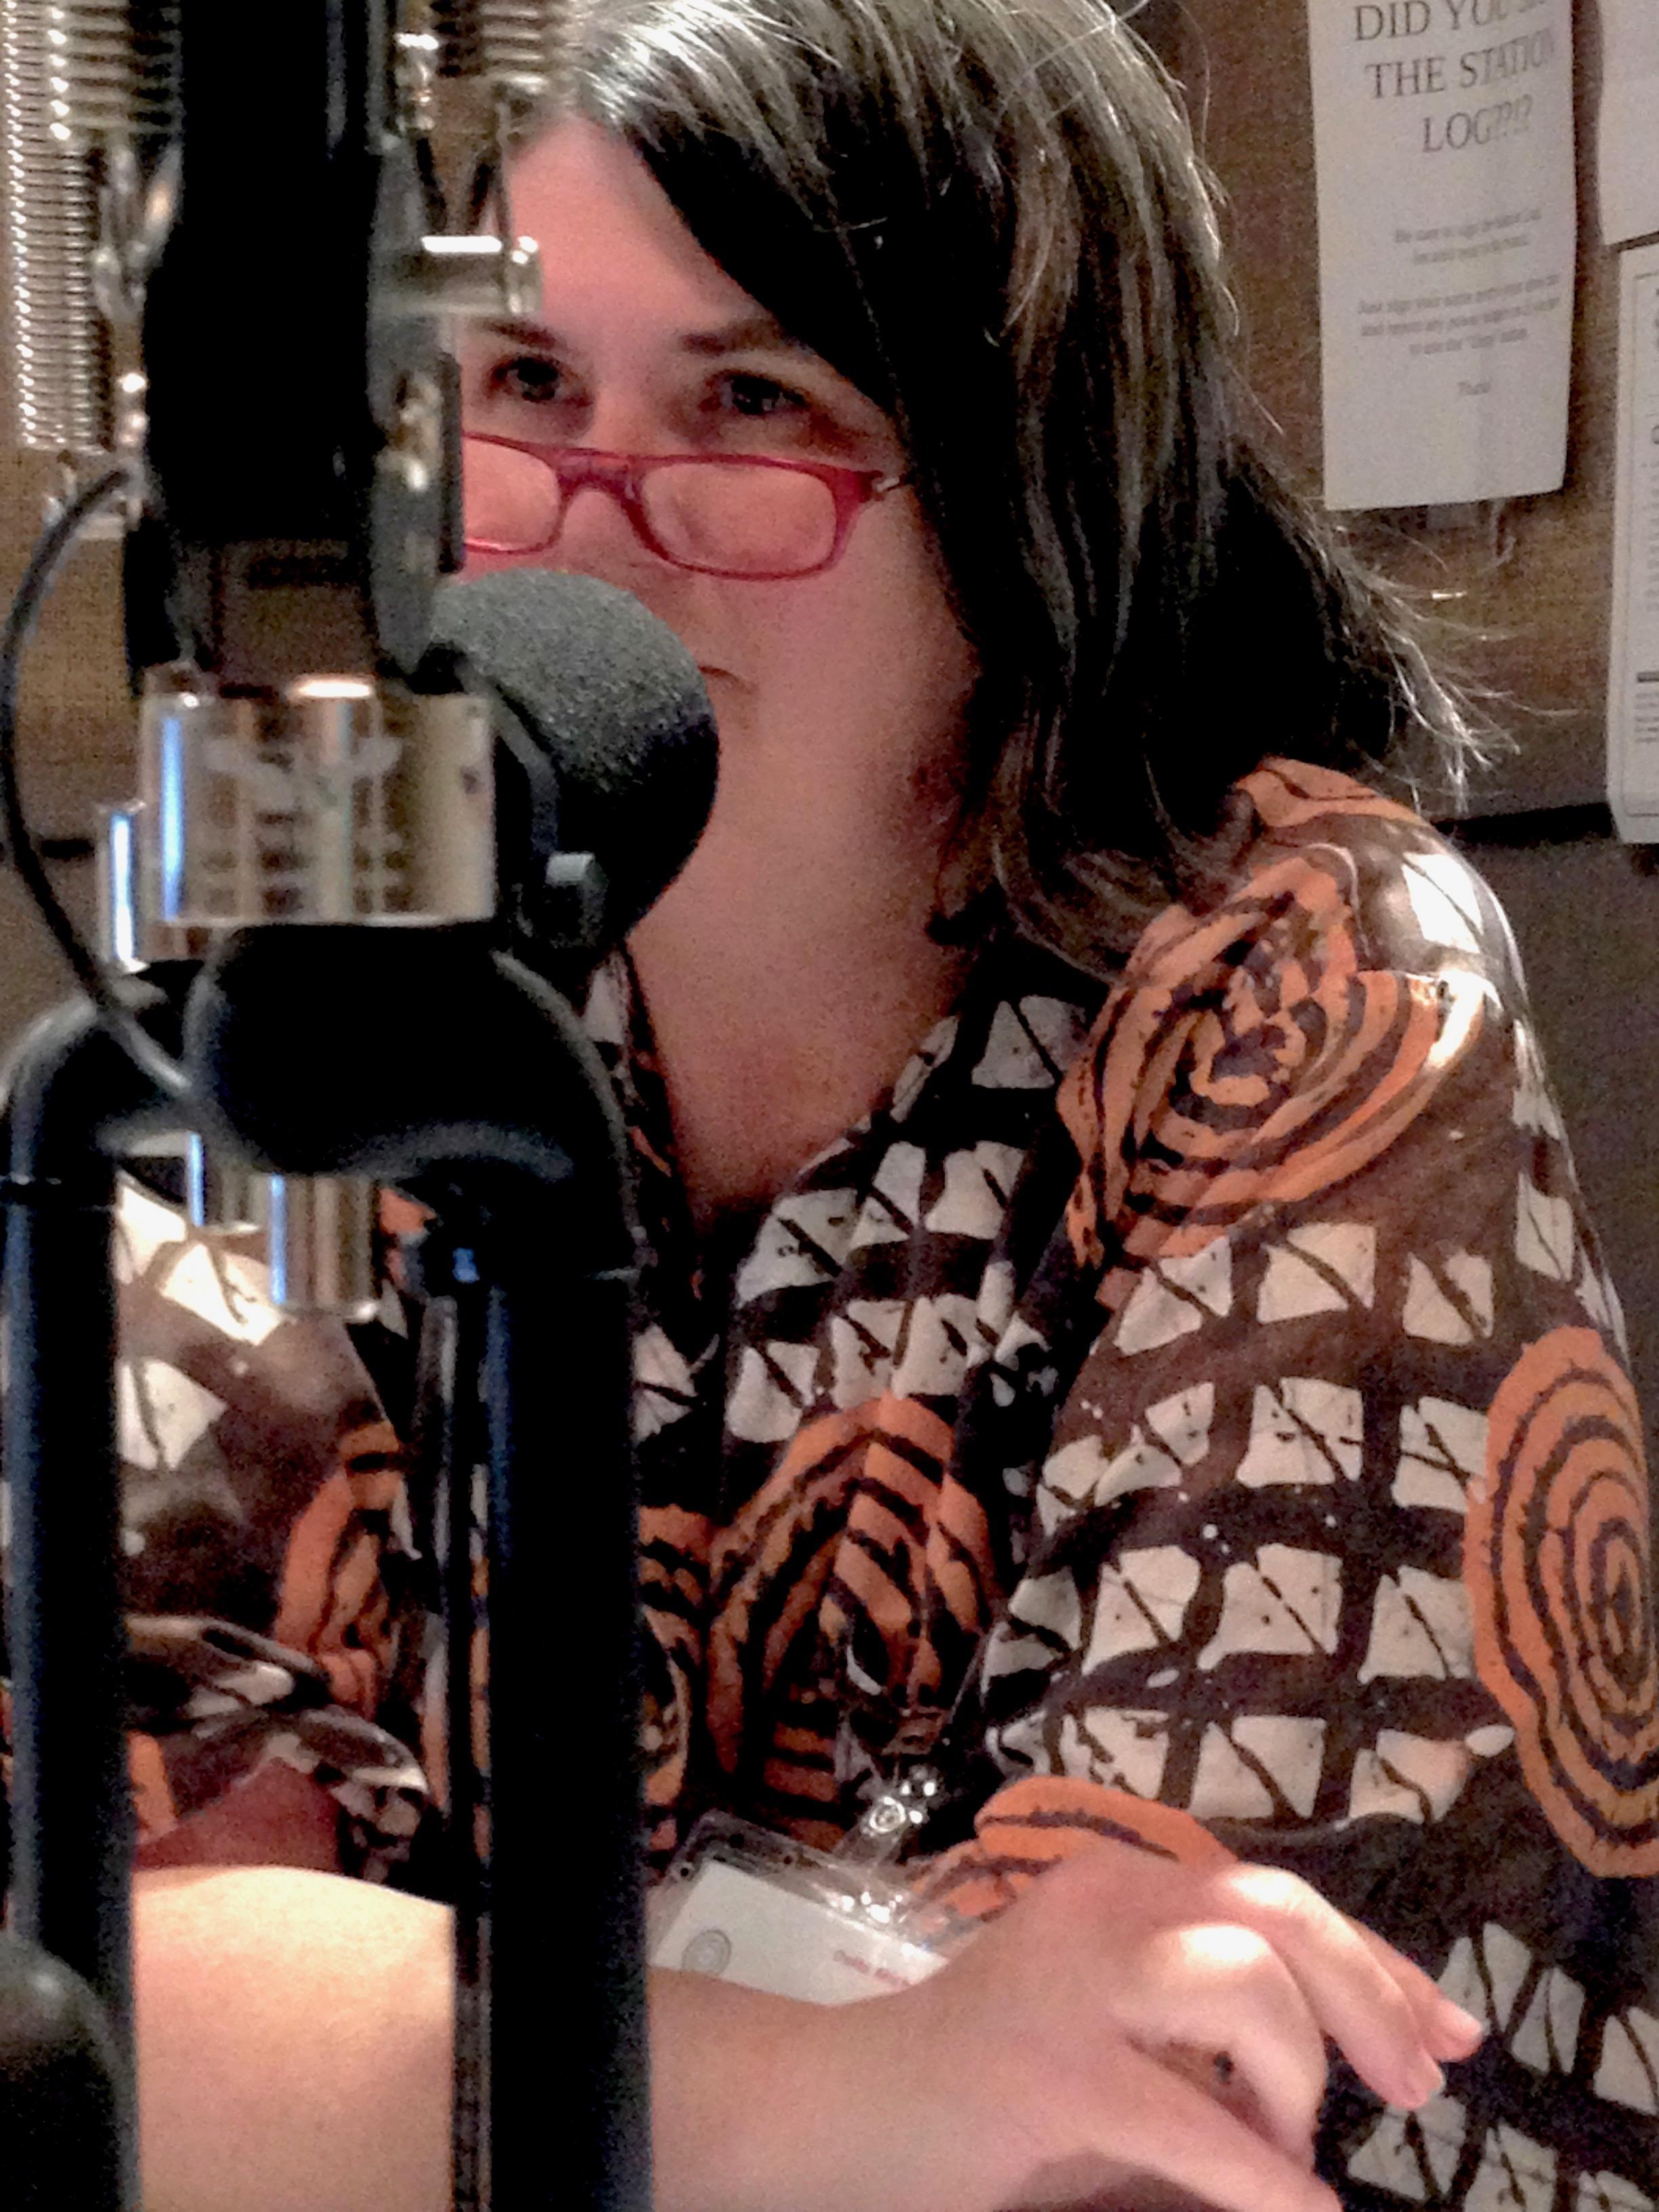 Chef Ouita Michel in the WLXU studios at  Lexington Community Radio .